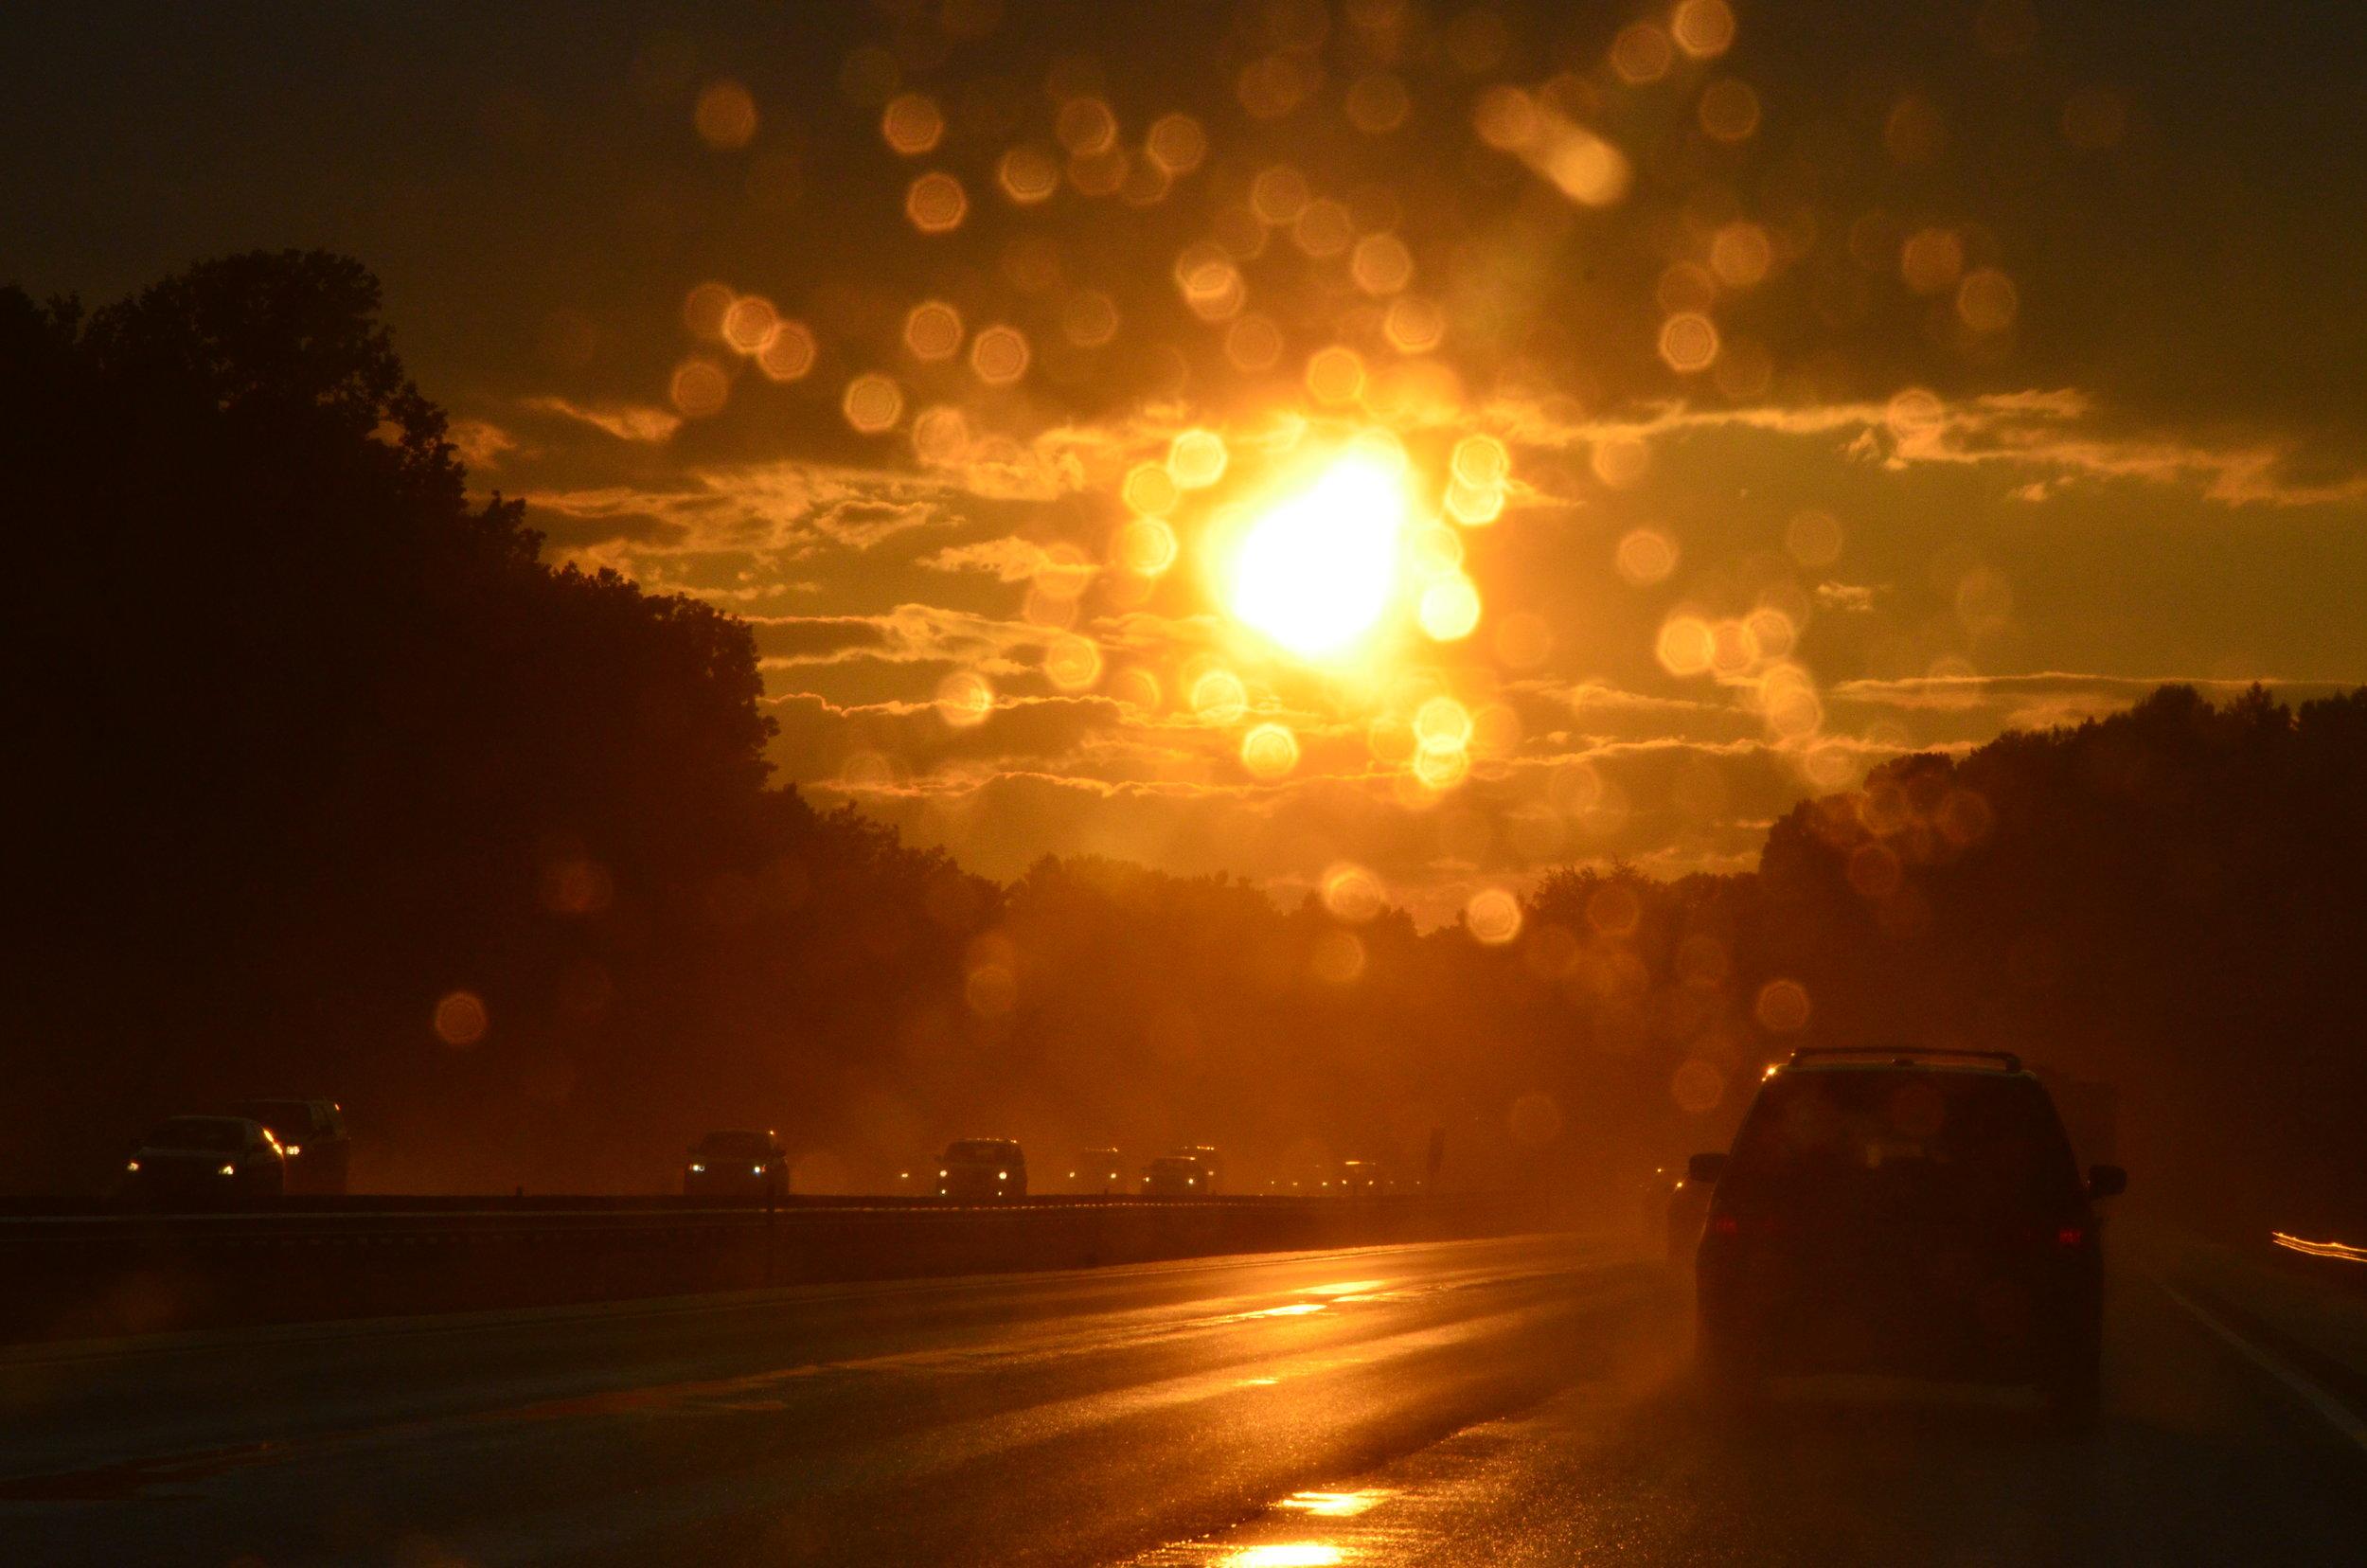 Copy of Sunshower at Sunset